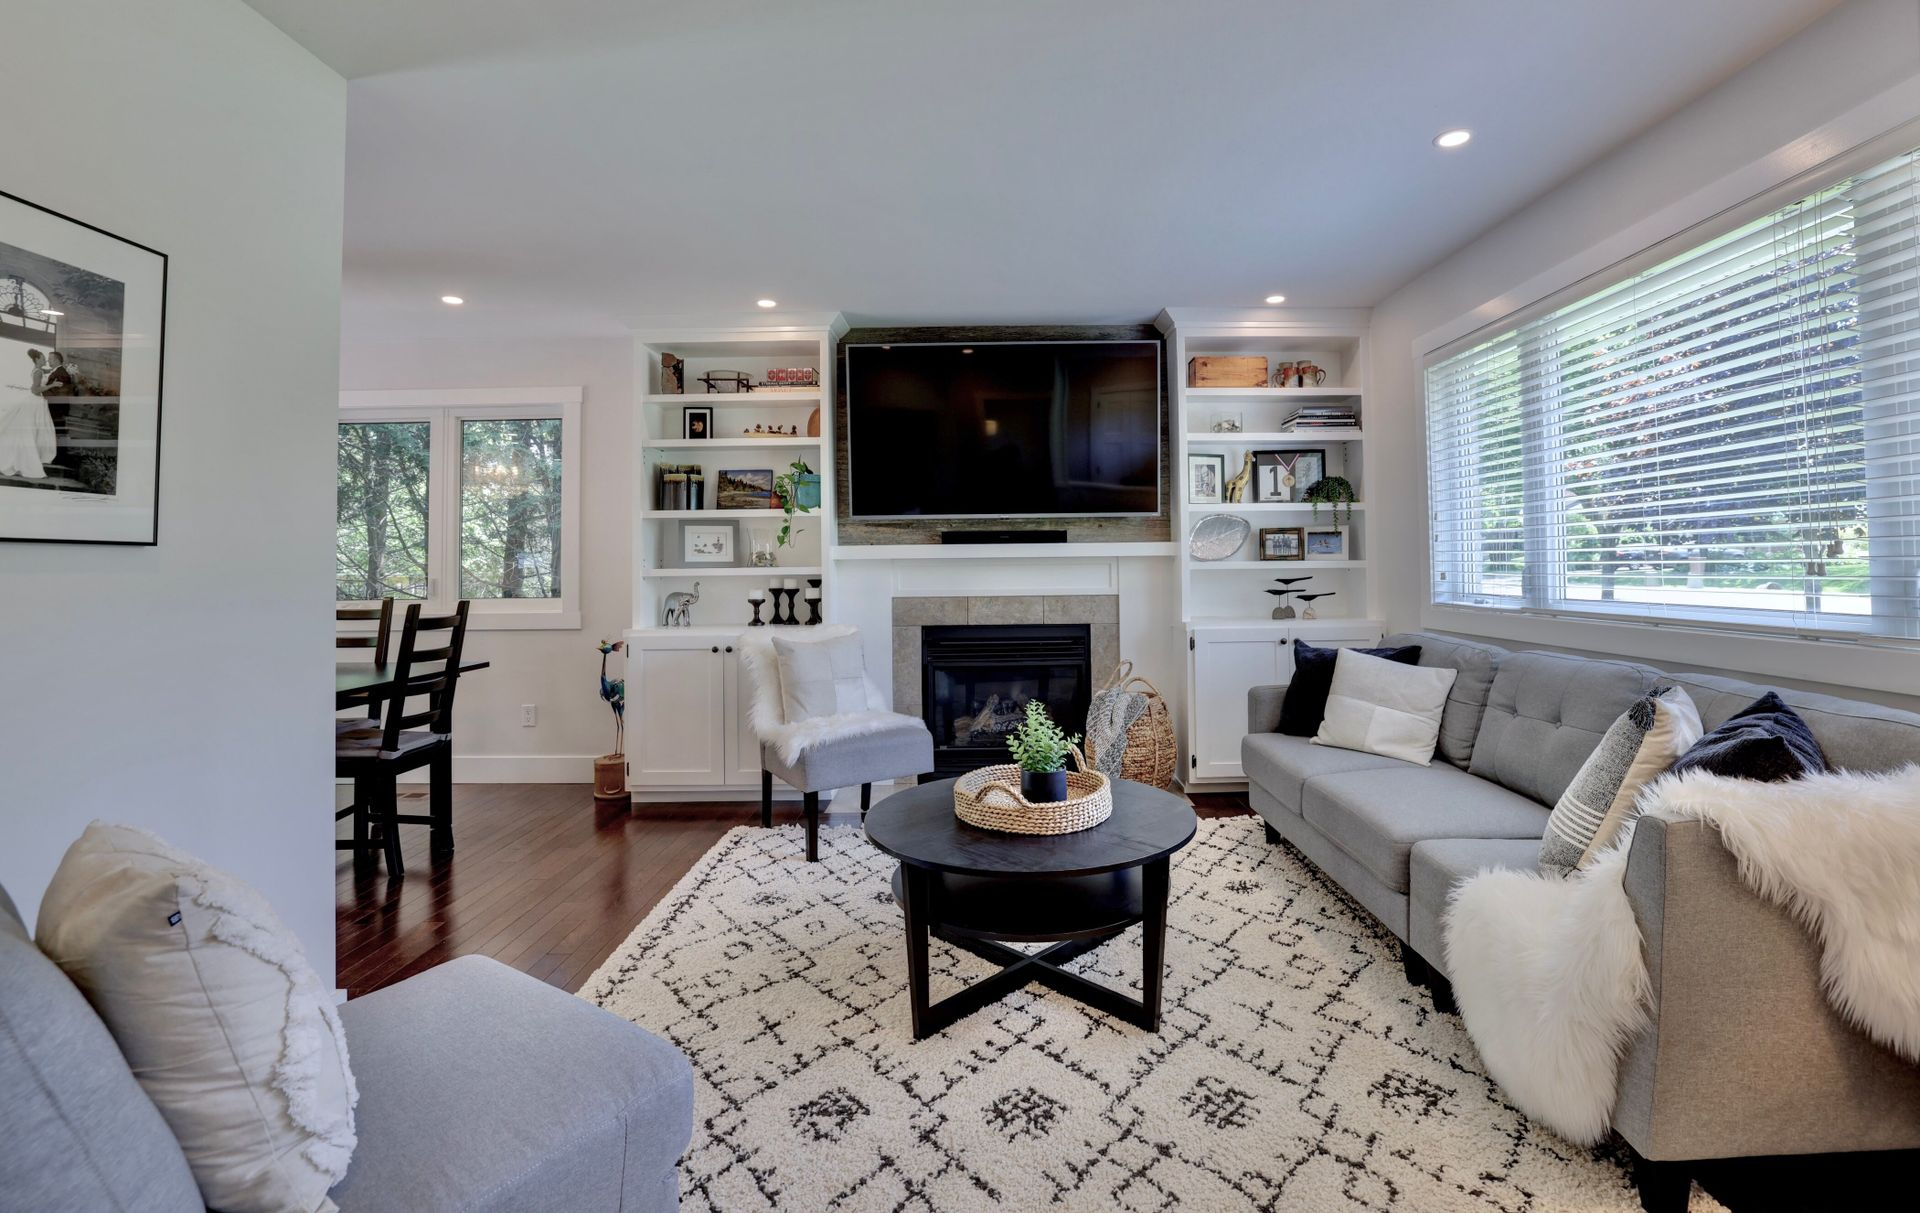 249-lakeview-ave-burlington-living-room1 at 249 Lakeview Ave, Burlington,